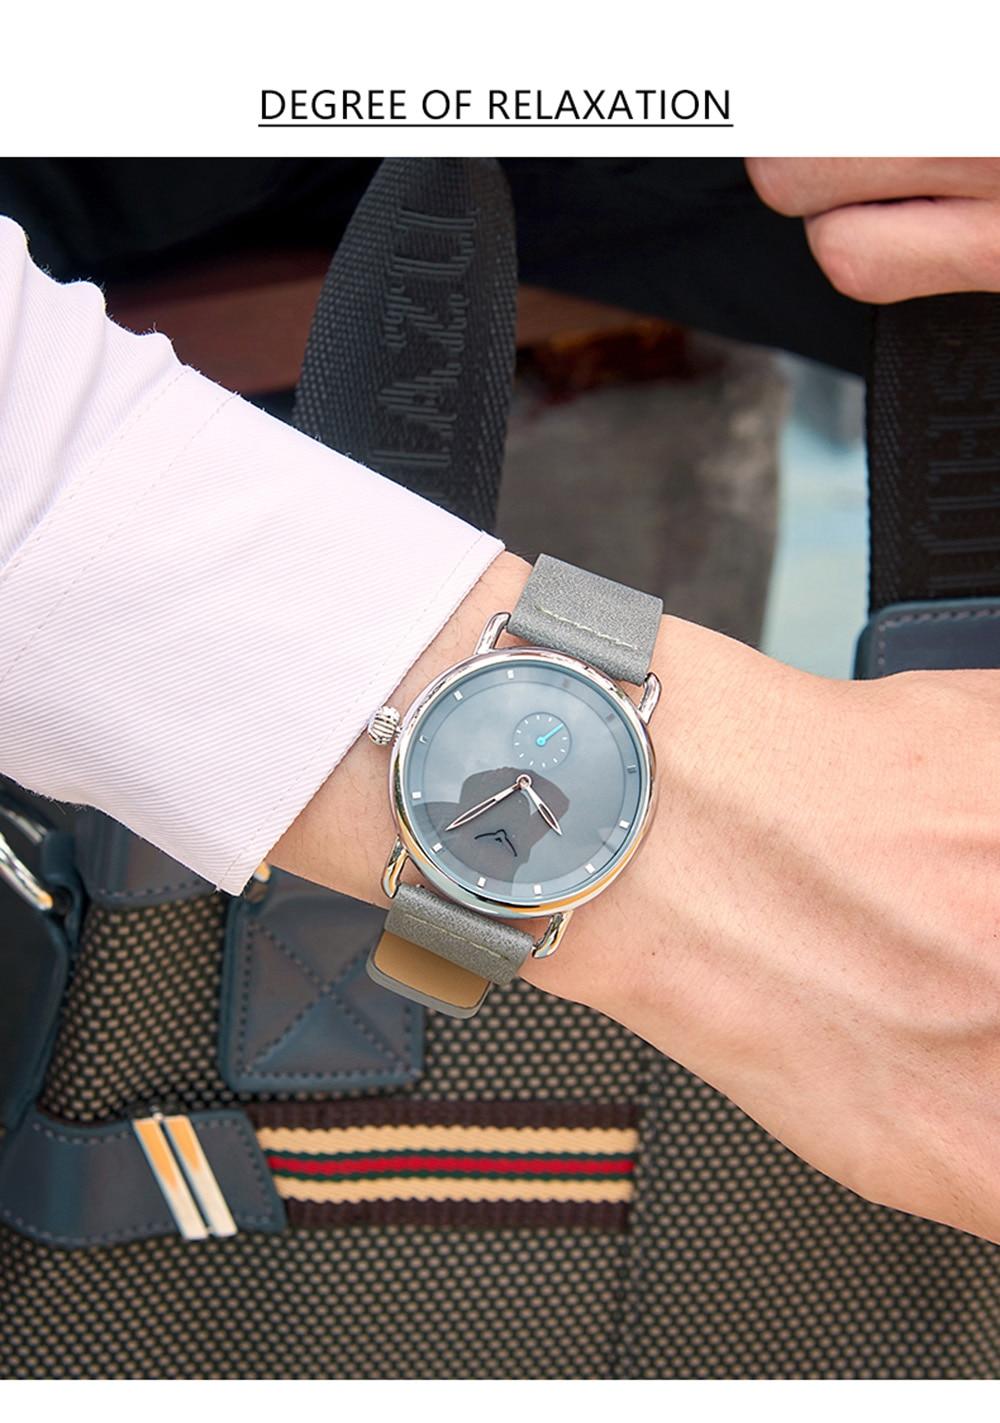 H4365b3d9658343388e2408f60c656788j ONOLA top brand leather men watches clock fashion sport simple casual waterproof Wrist watch men relogio masculino